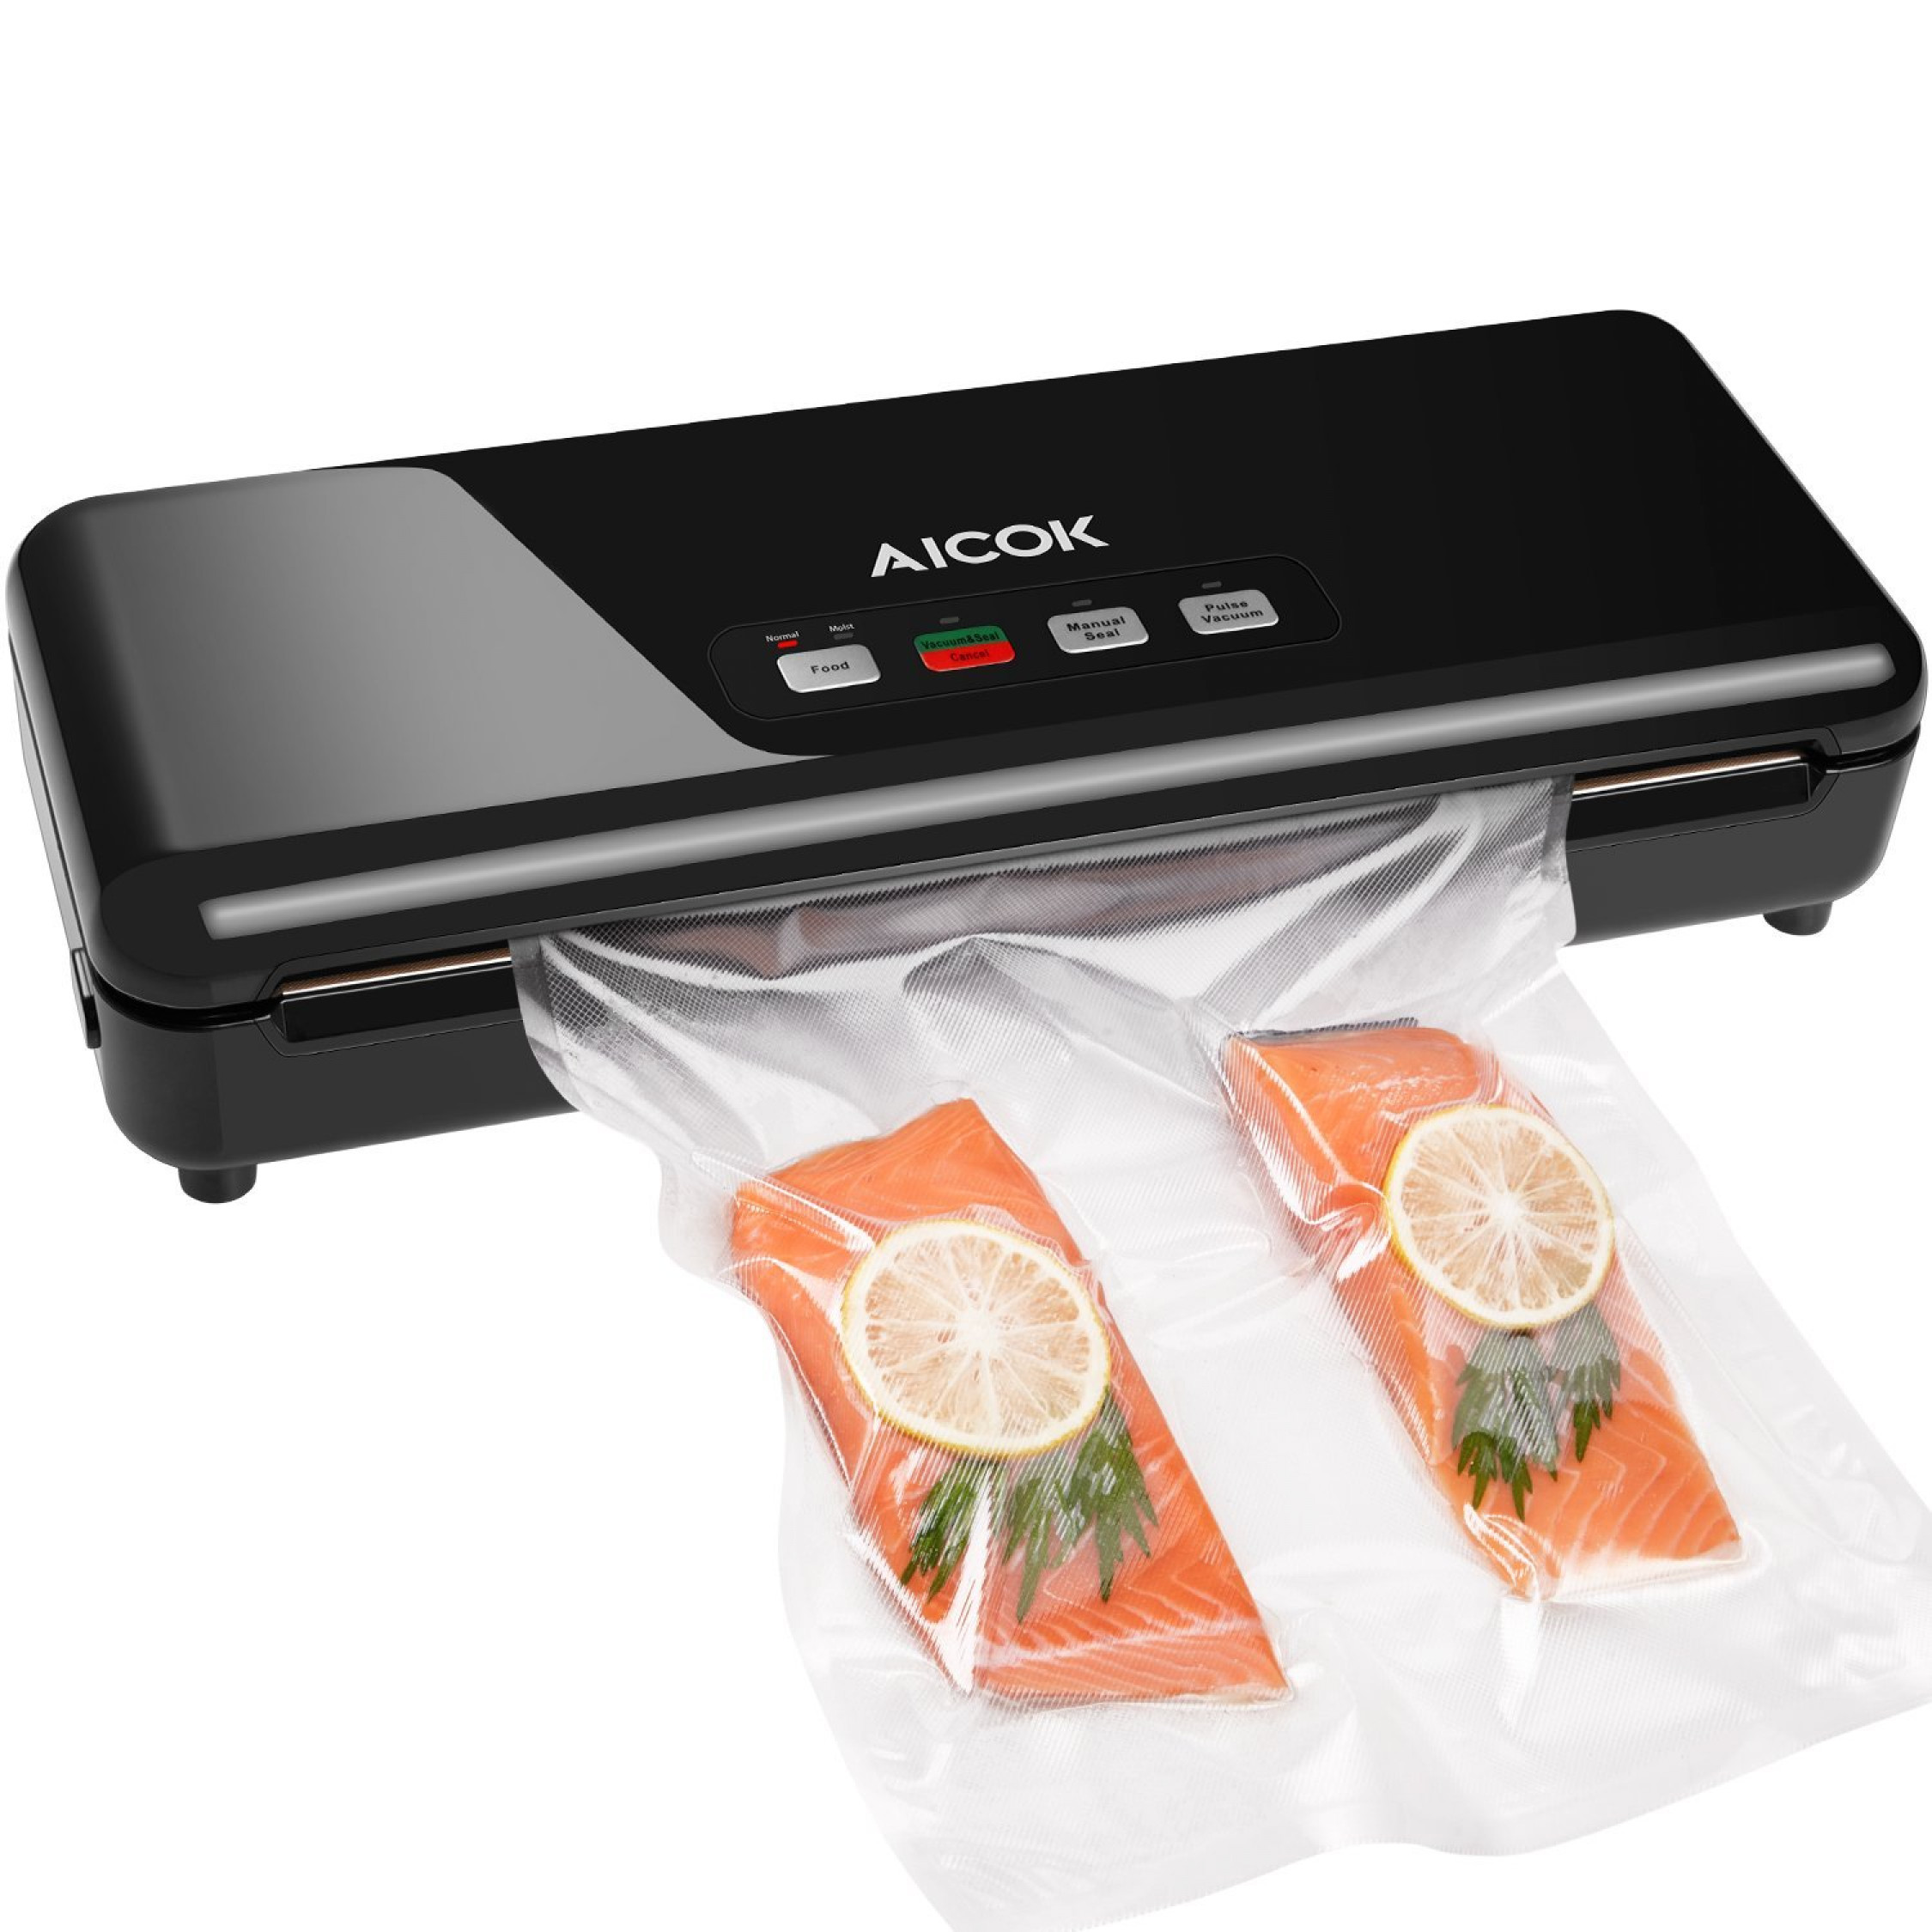 Vacuum-Food-Sealer-3In1-Automatic-Manual-Vacum-Sealer-Dry-Wet-Pack-Machine-New